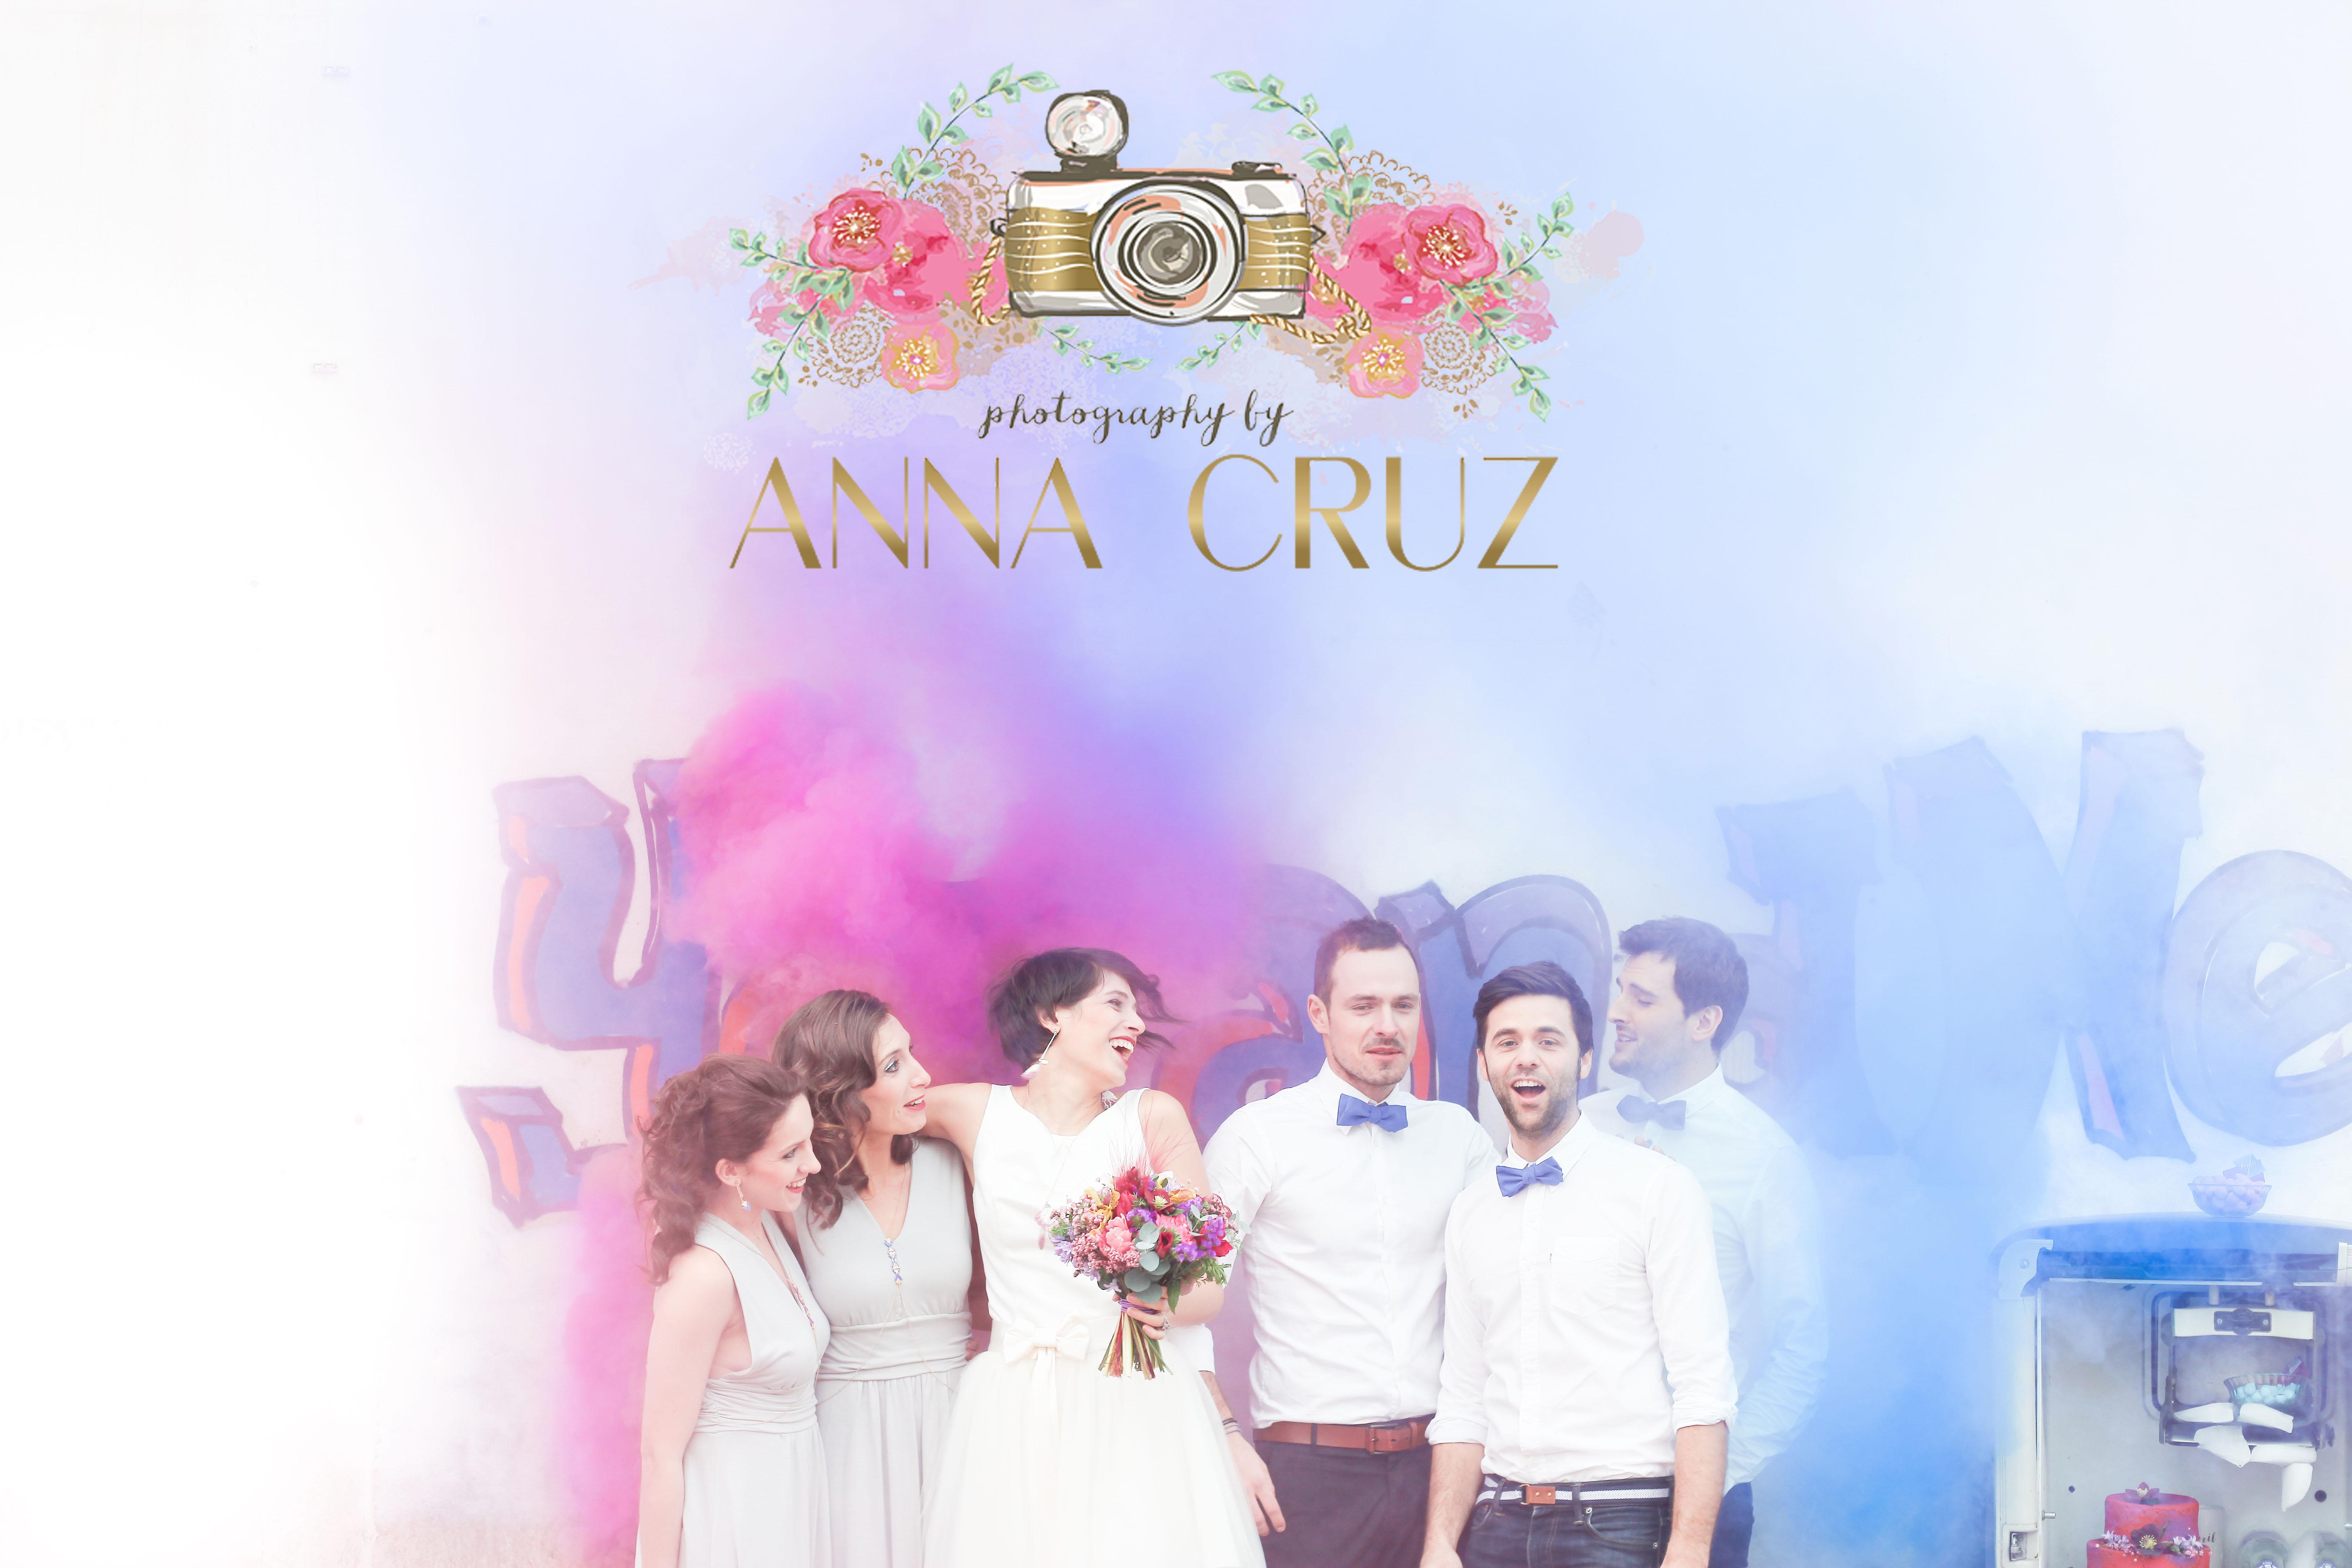 Anna Cruz Photo